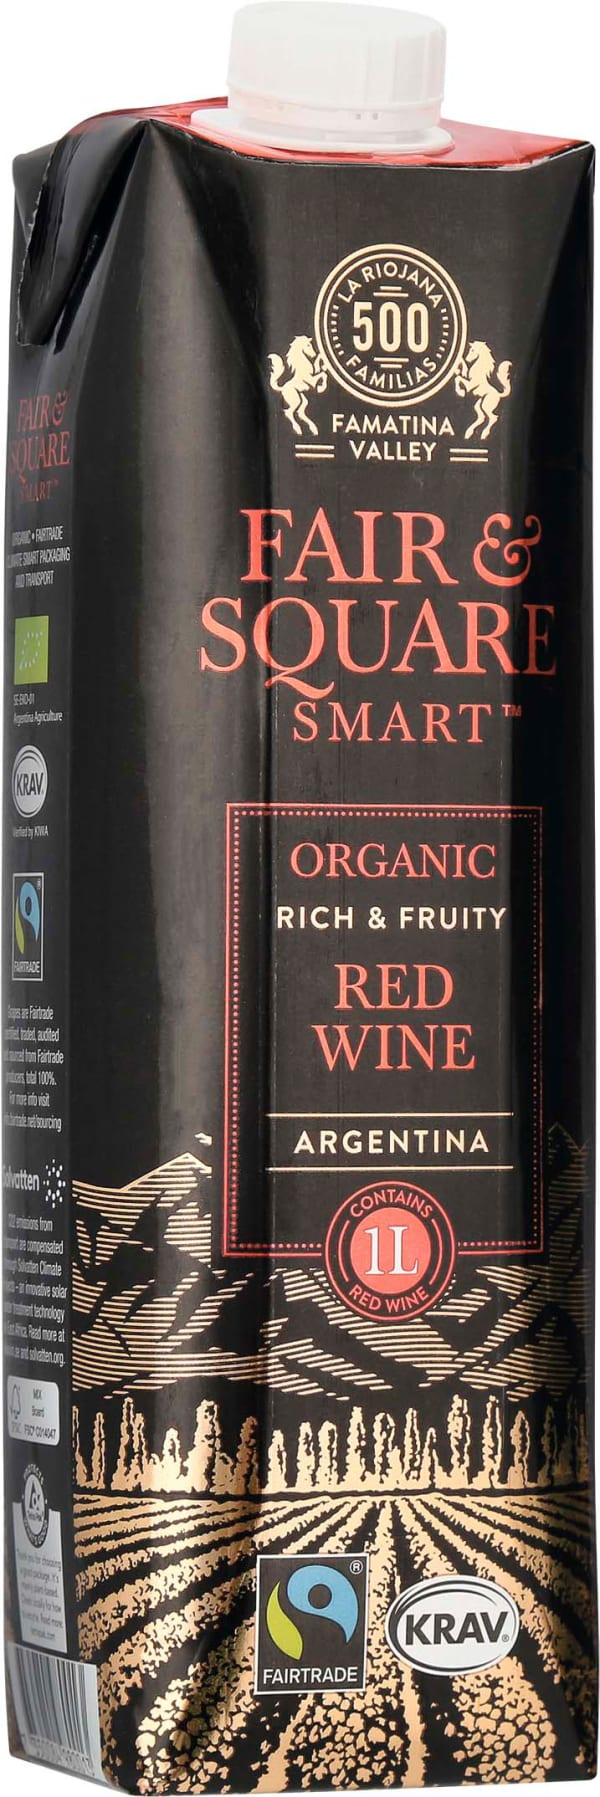 Fair & Square Red 2019 kartongförpackning